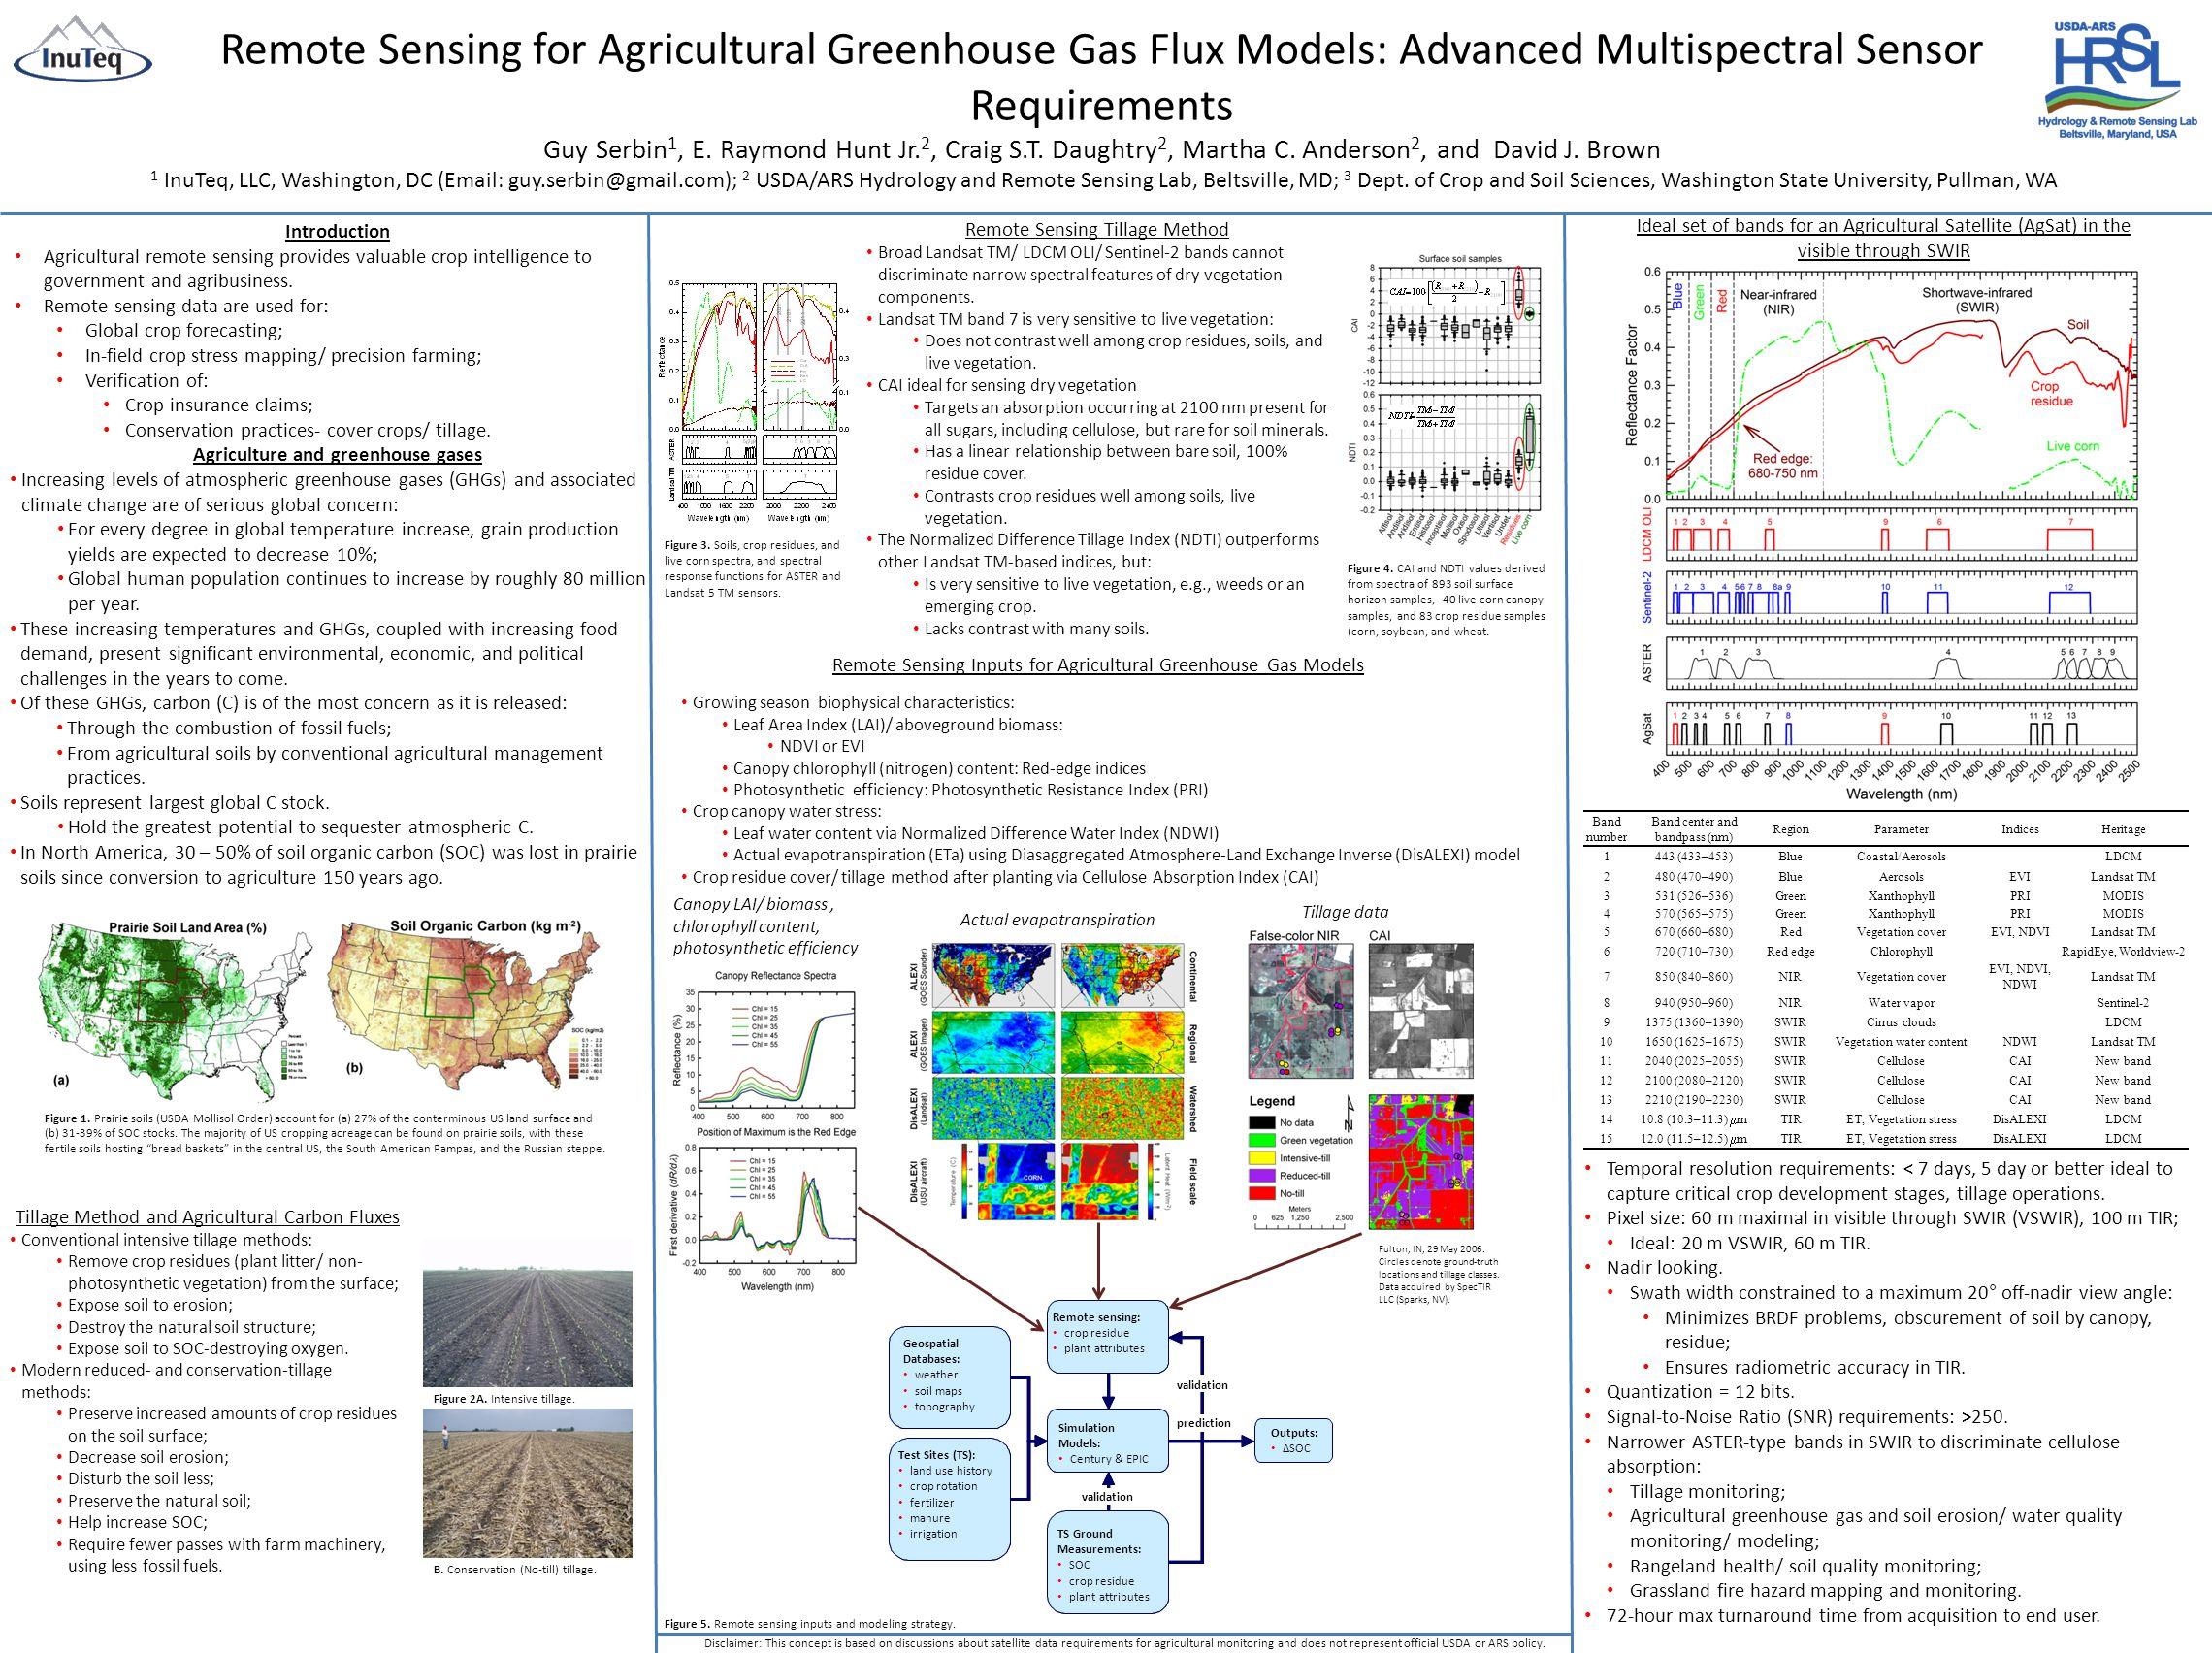 Remote Sensing for Agricultural Greenhouse Gas Flux Models: Advanced Multispectral Sensor Requirements Guy Serbin 1, E.